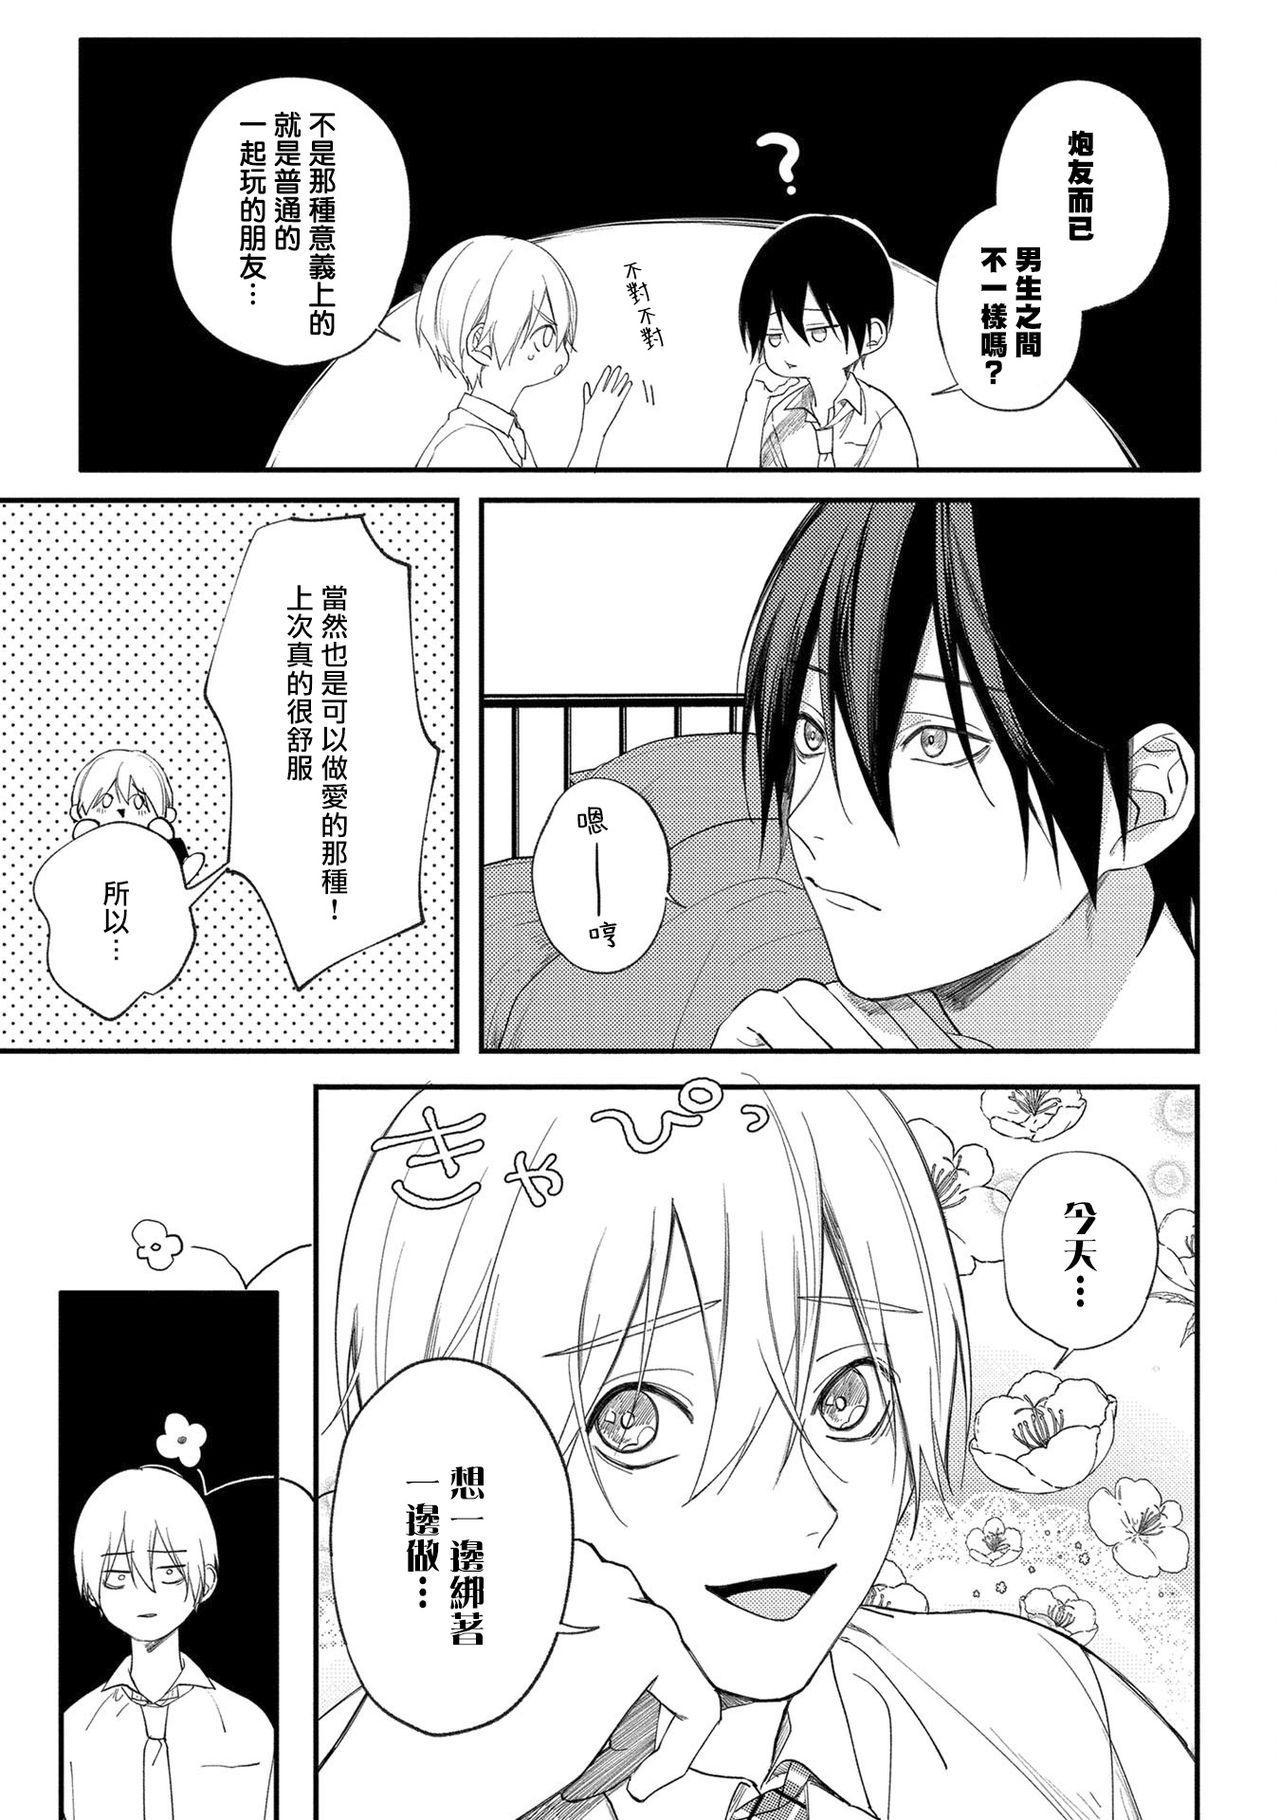 [Utata Hakuto] Houkago Virginity - Virginity afterschool 1-3 [Chinese] [拾荒者汉化组] [Digital] 45